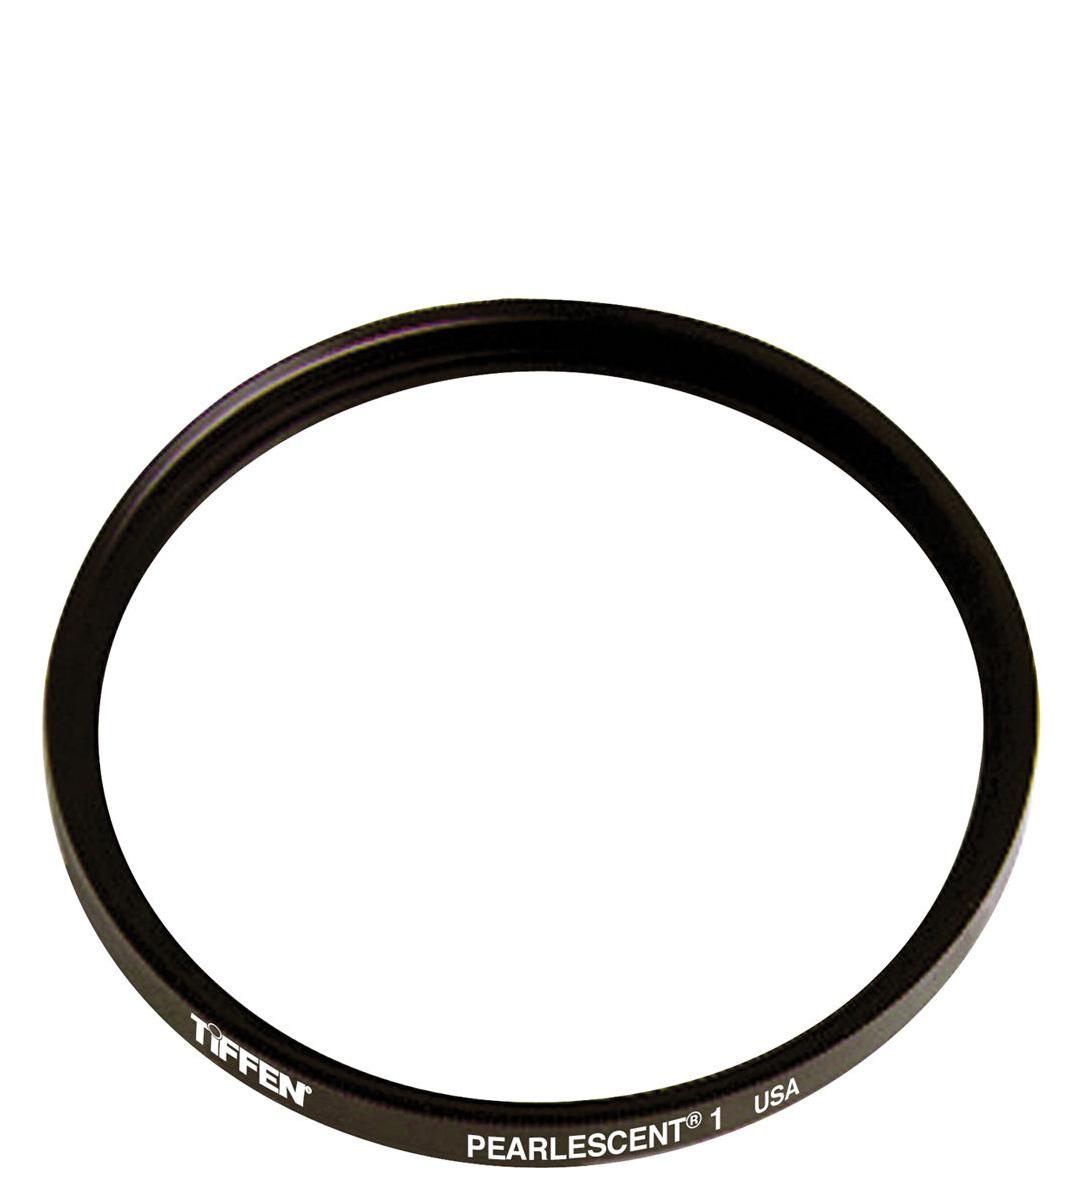 Filtro de lente Tiffen - Pearlescent 1 - 82mm